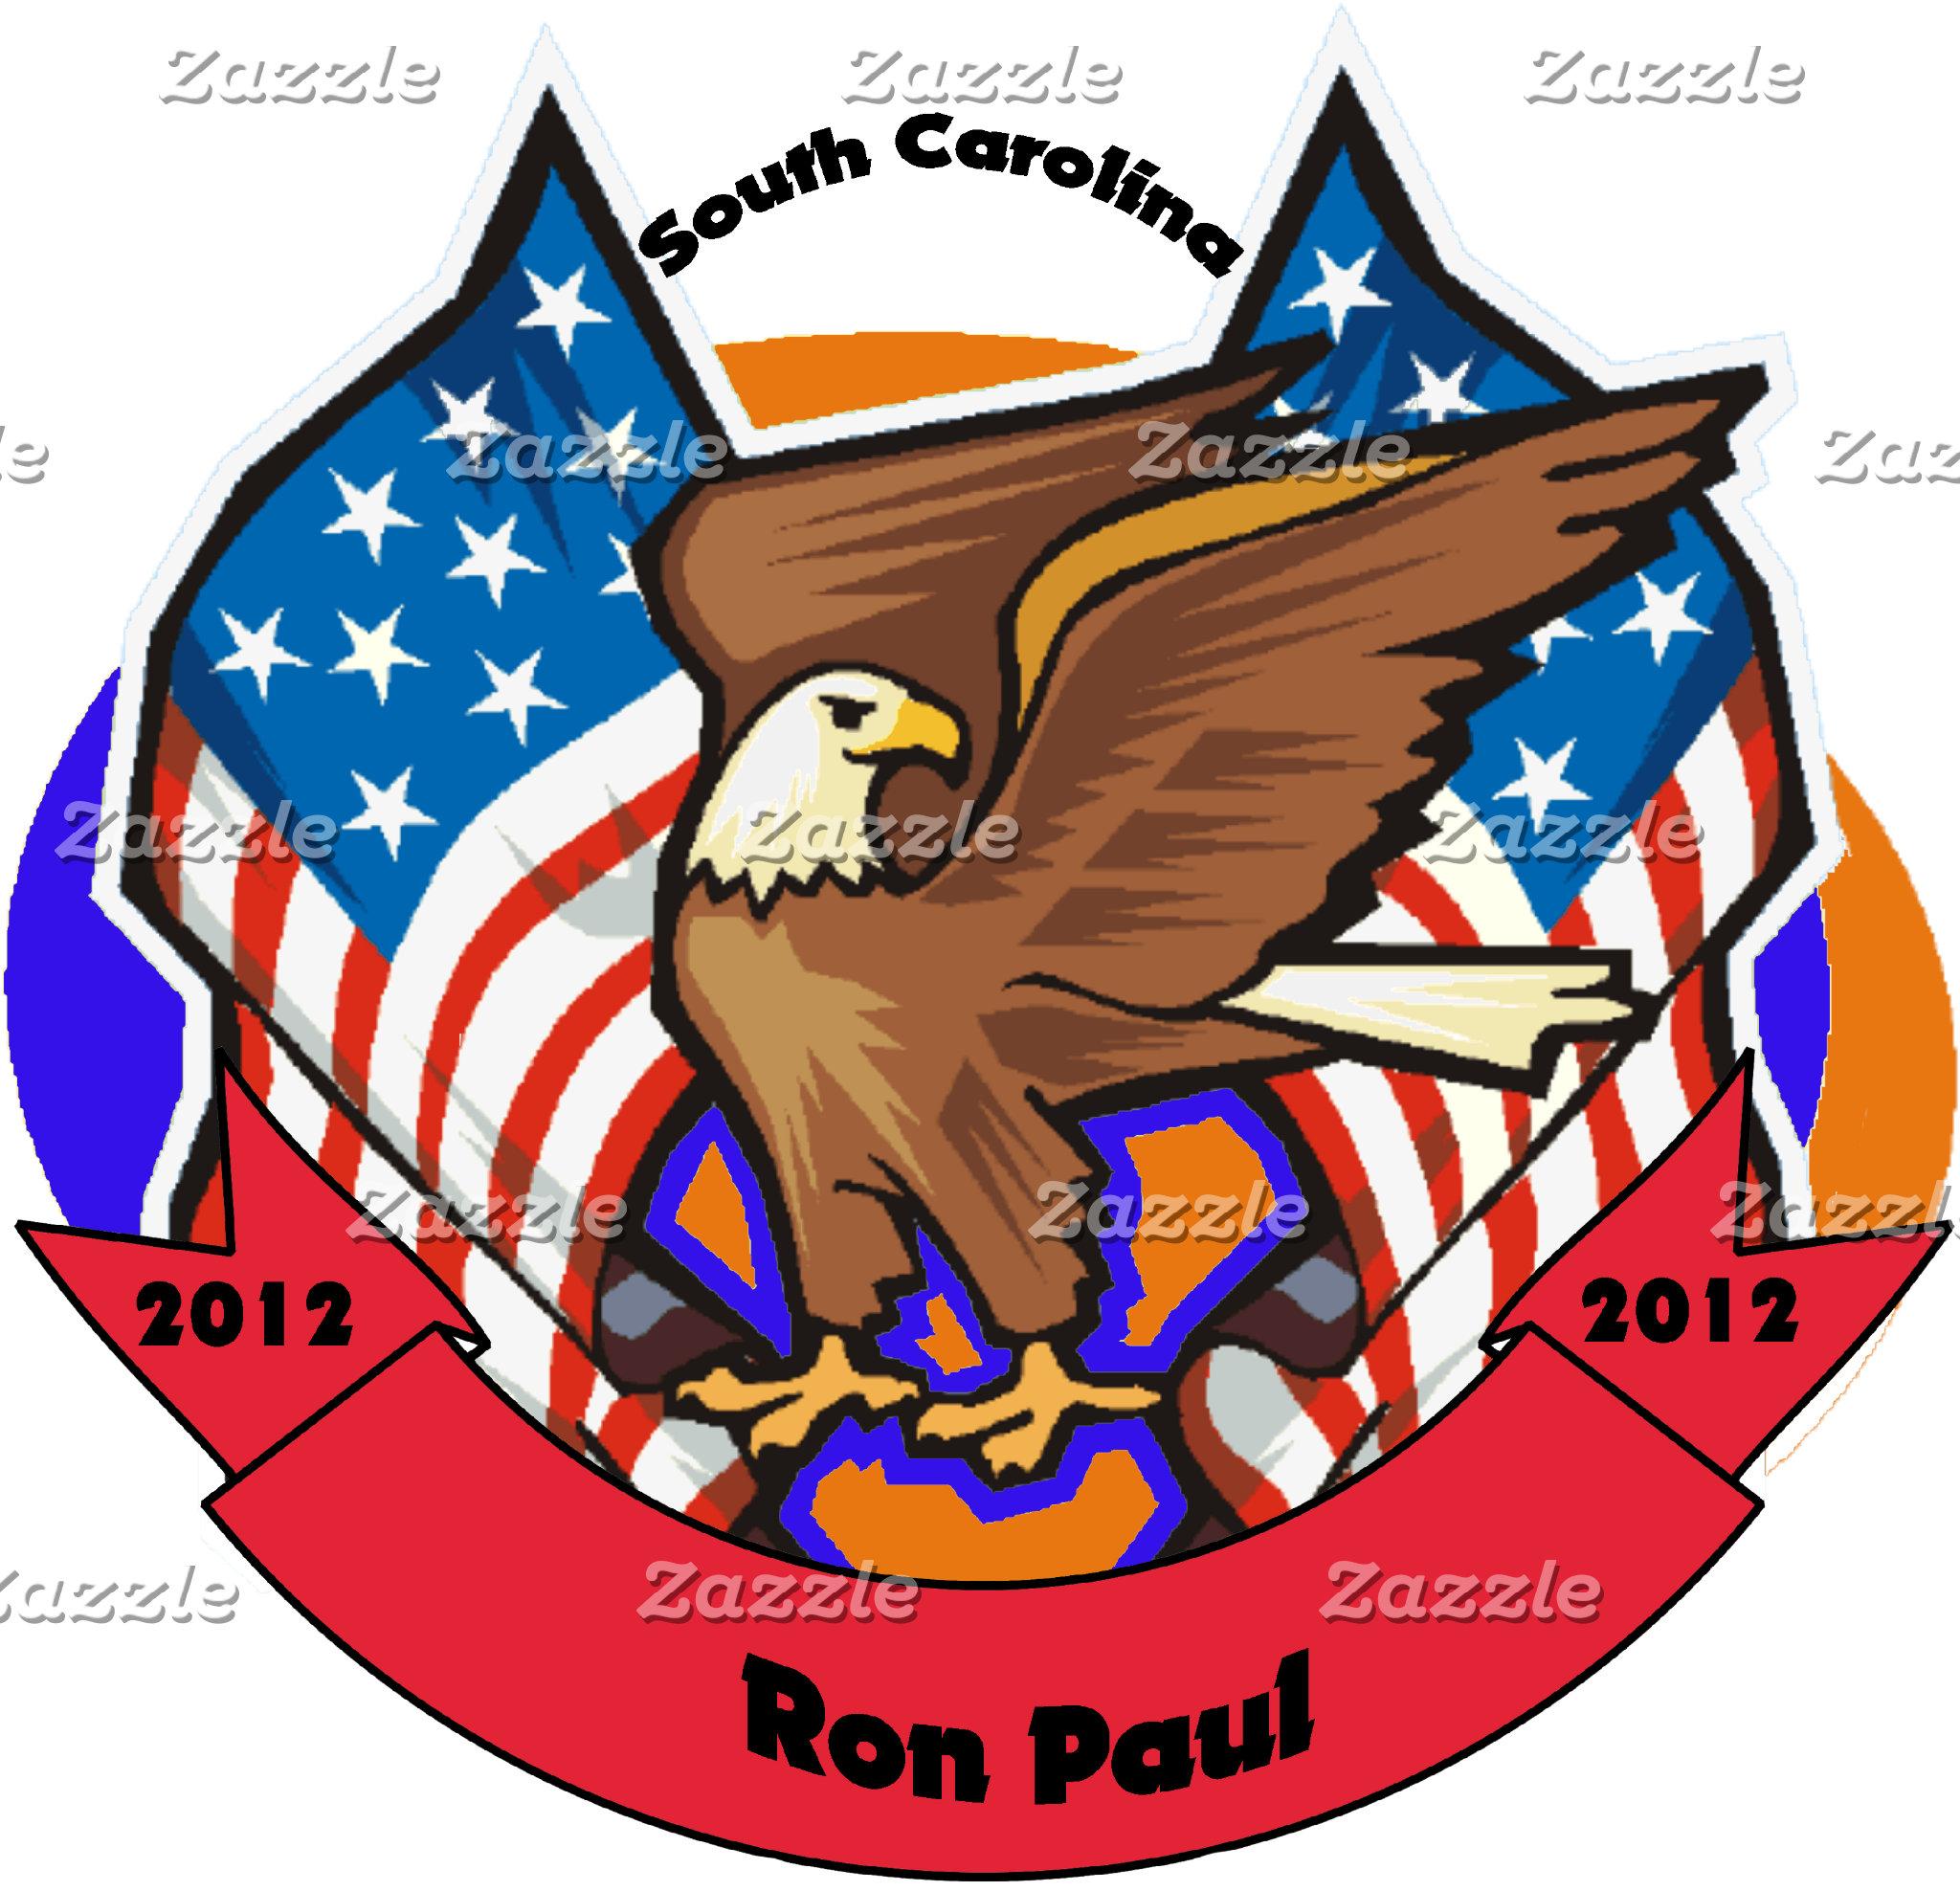 South Carolina for Ron Paul